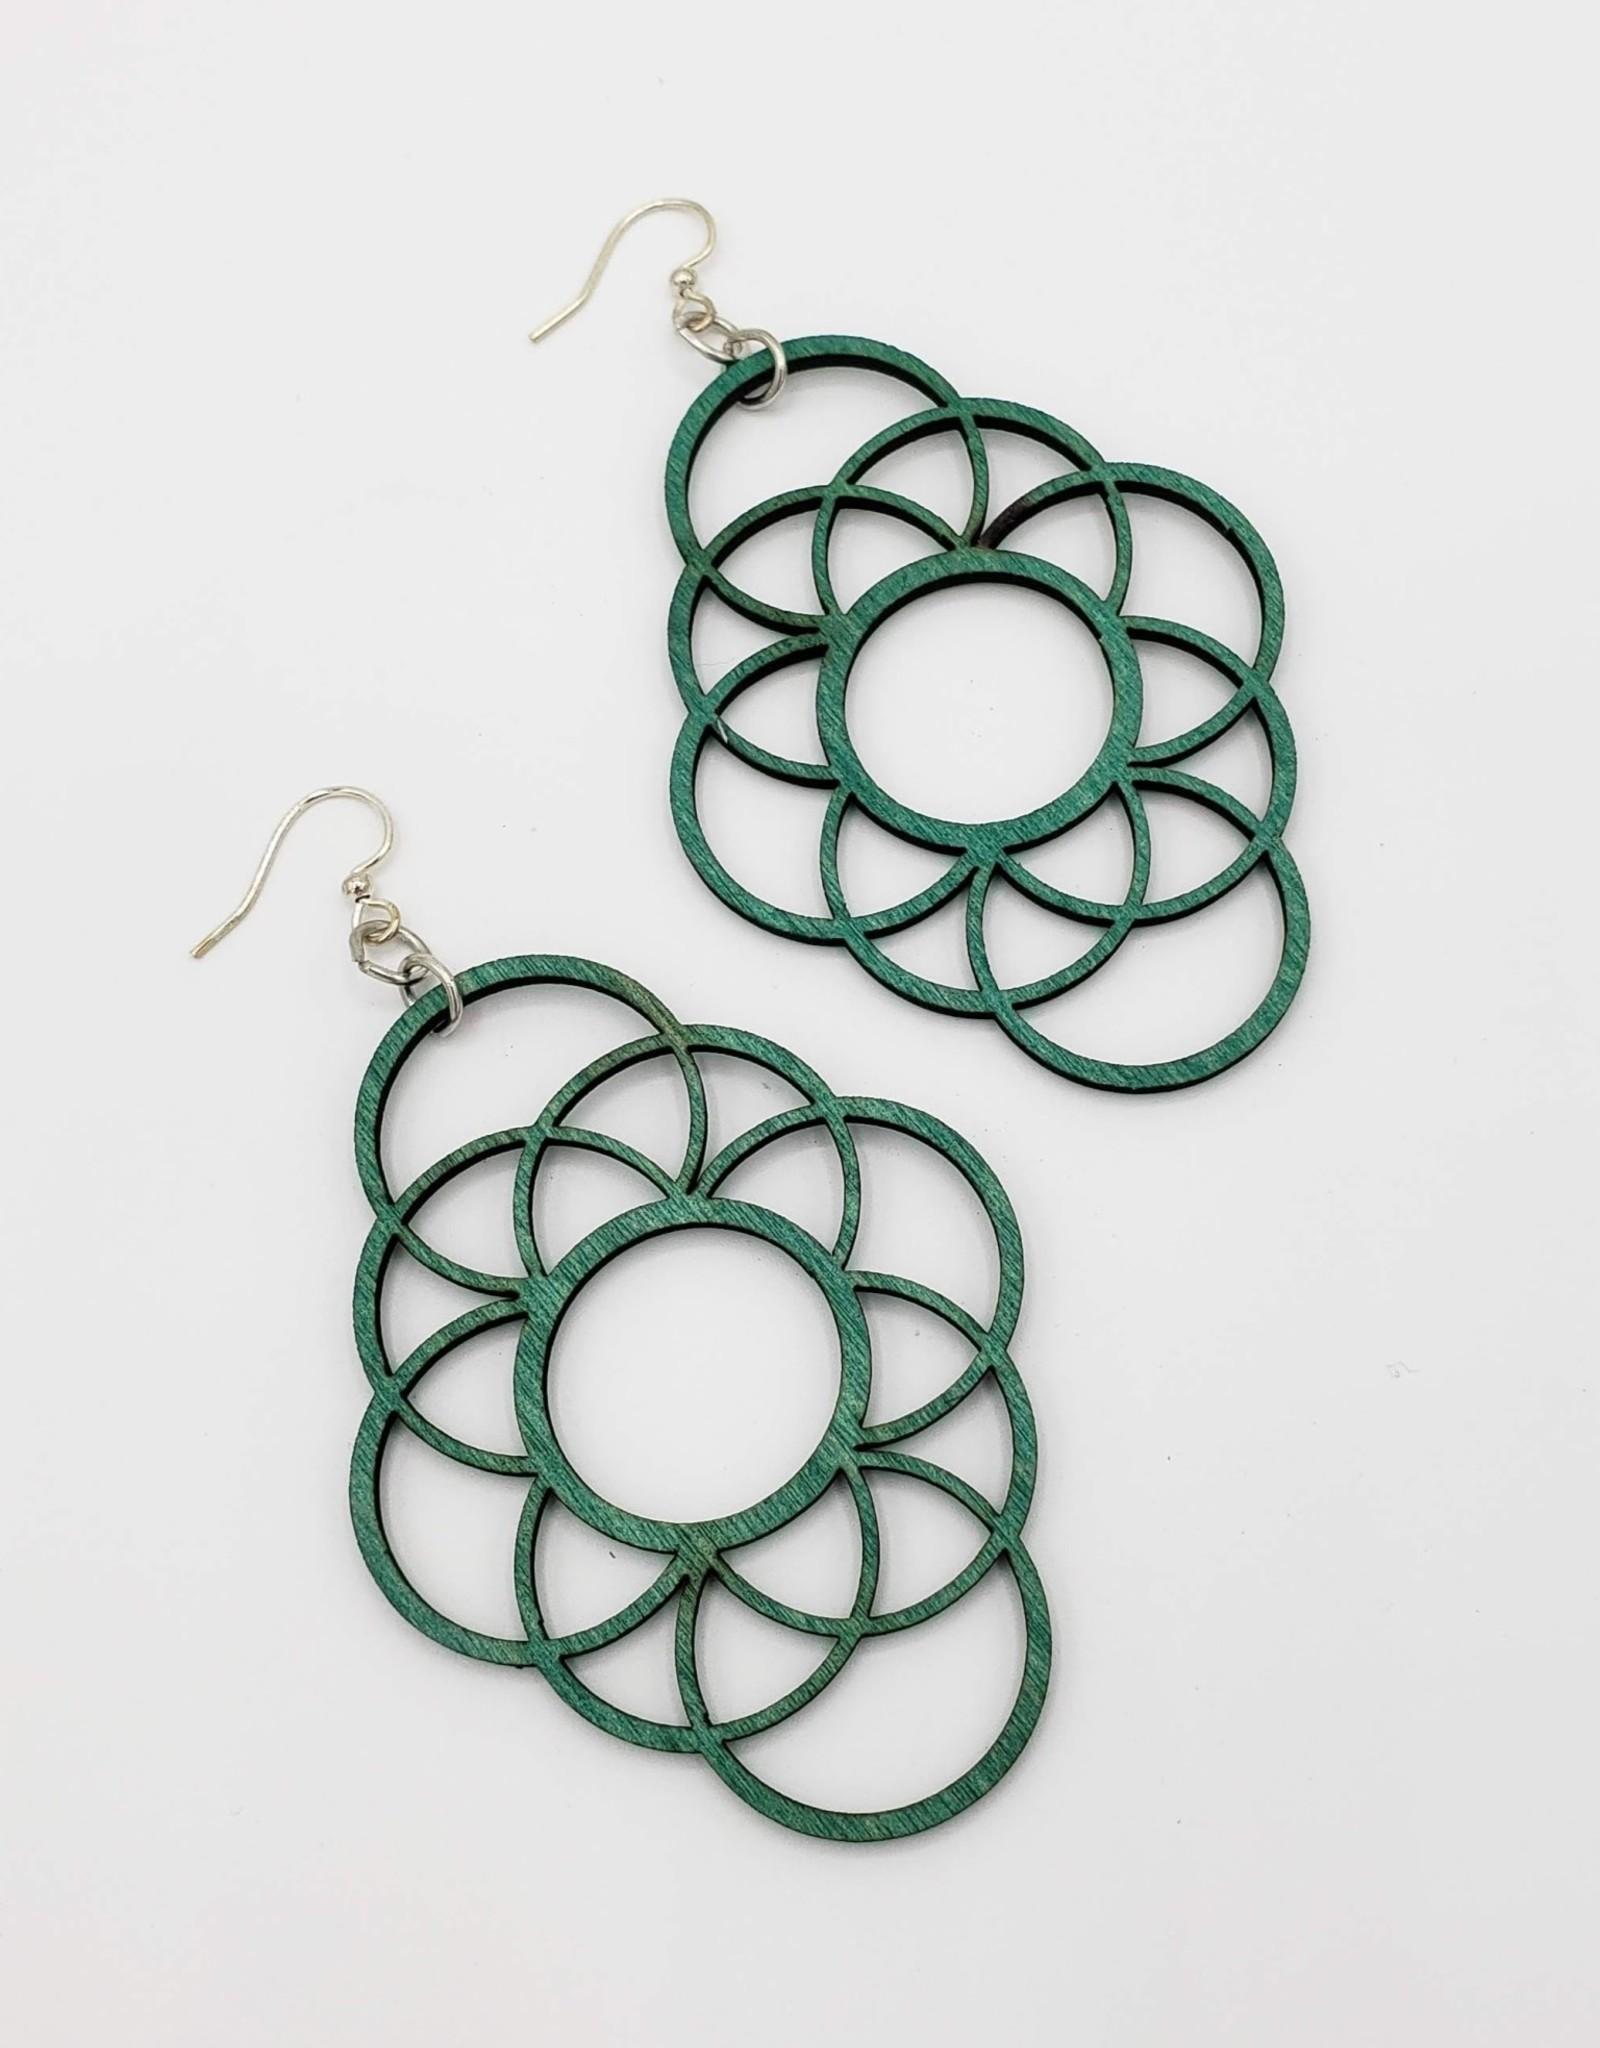 Green Tree Jewelry Laser Cut Wood Earring - Teal Long Circle Oblong